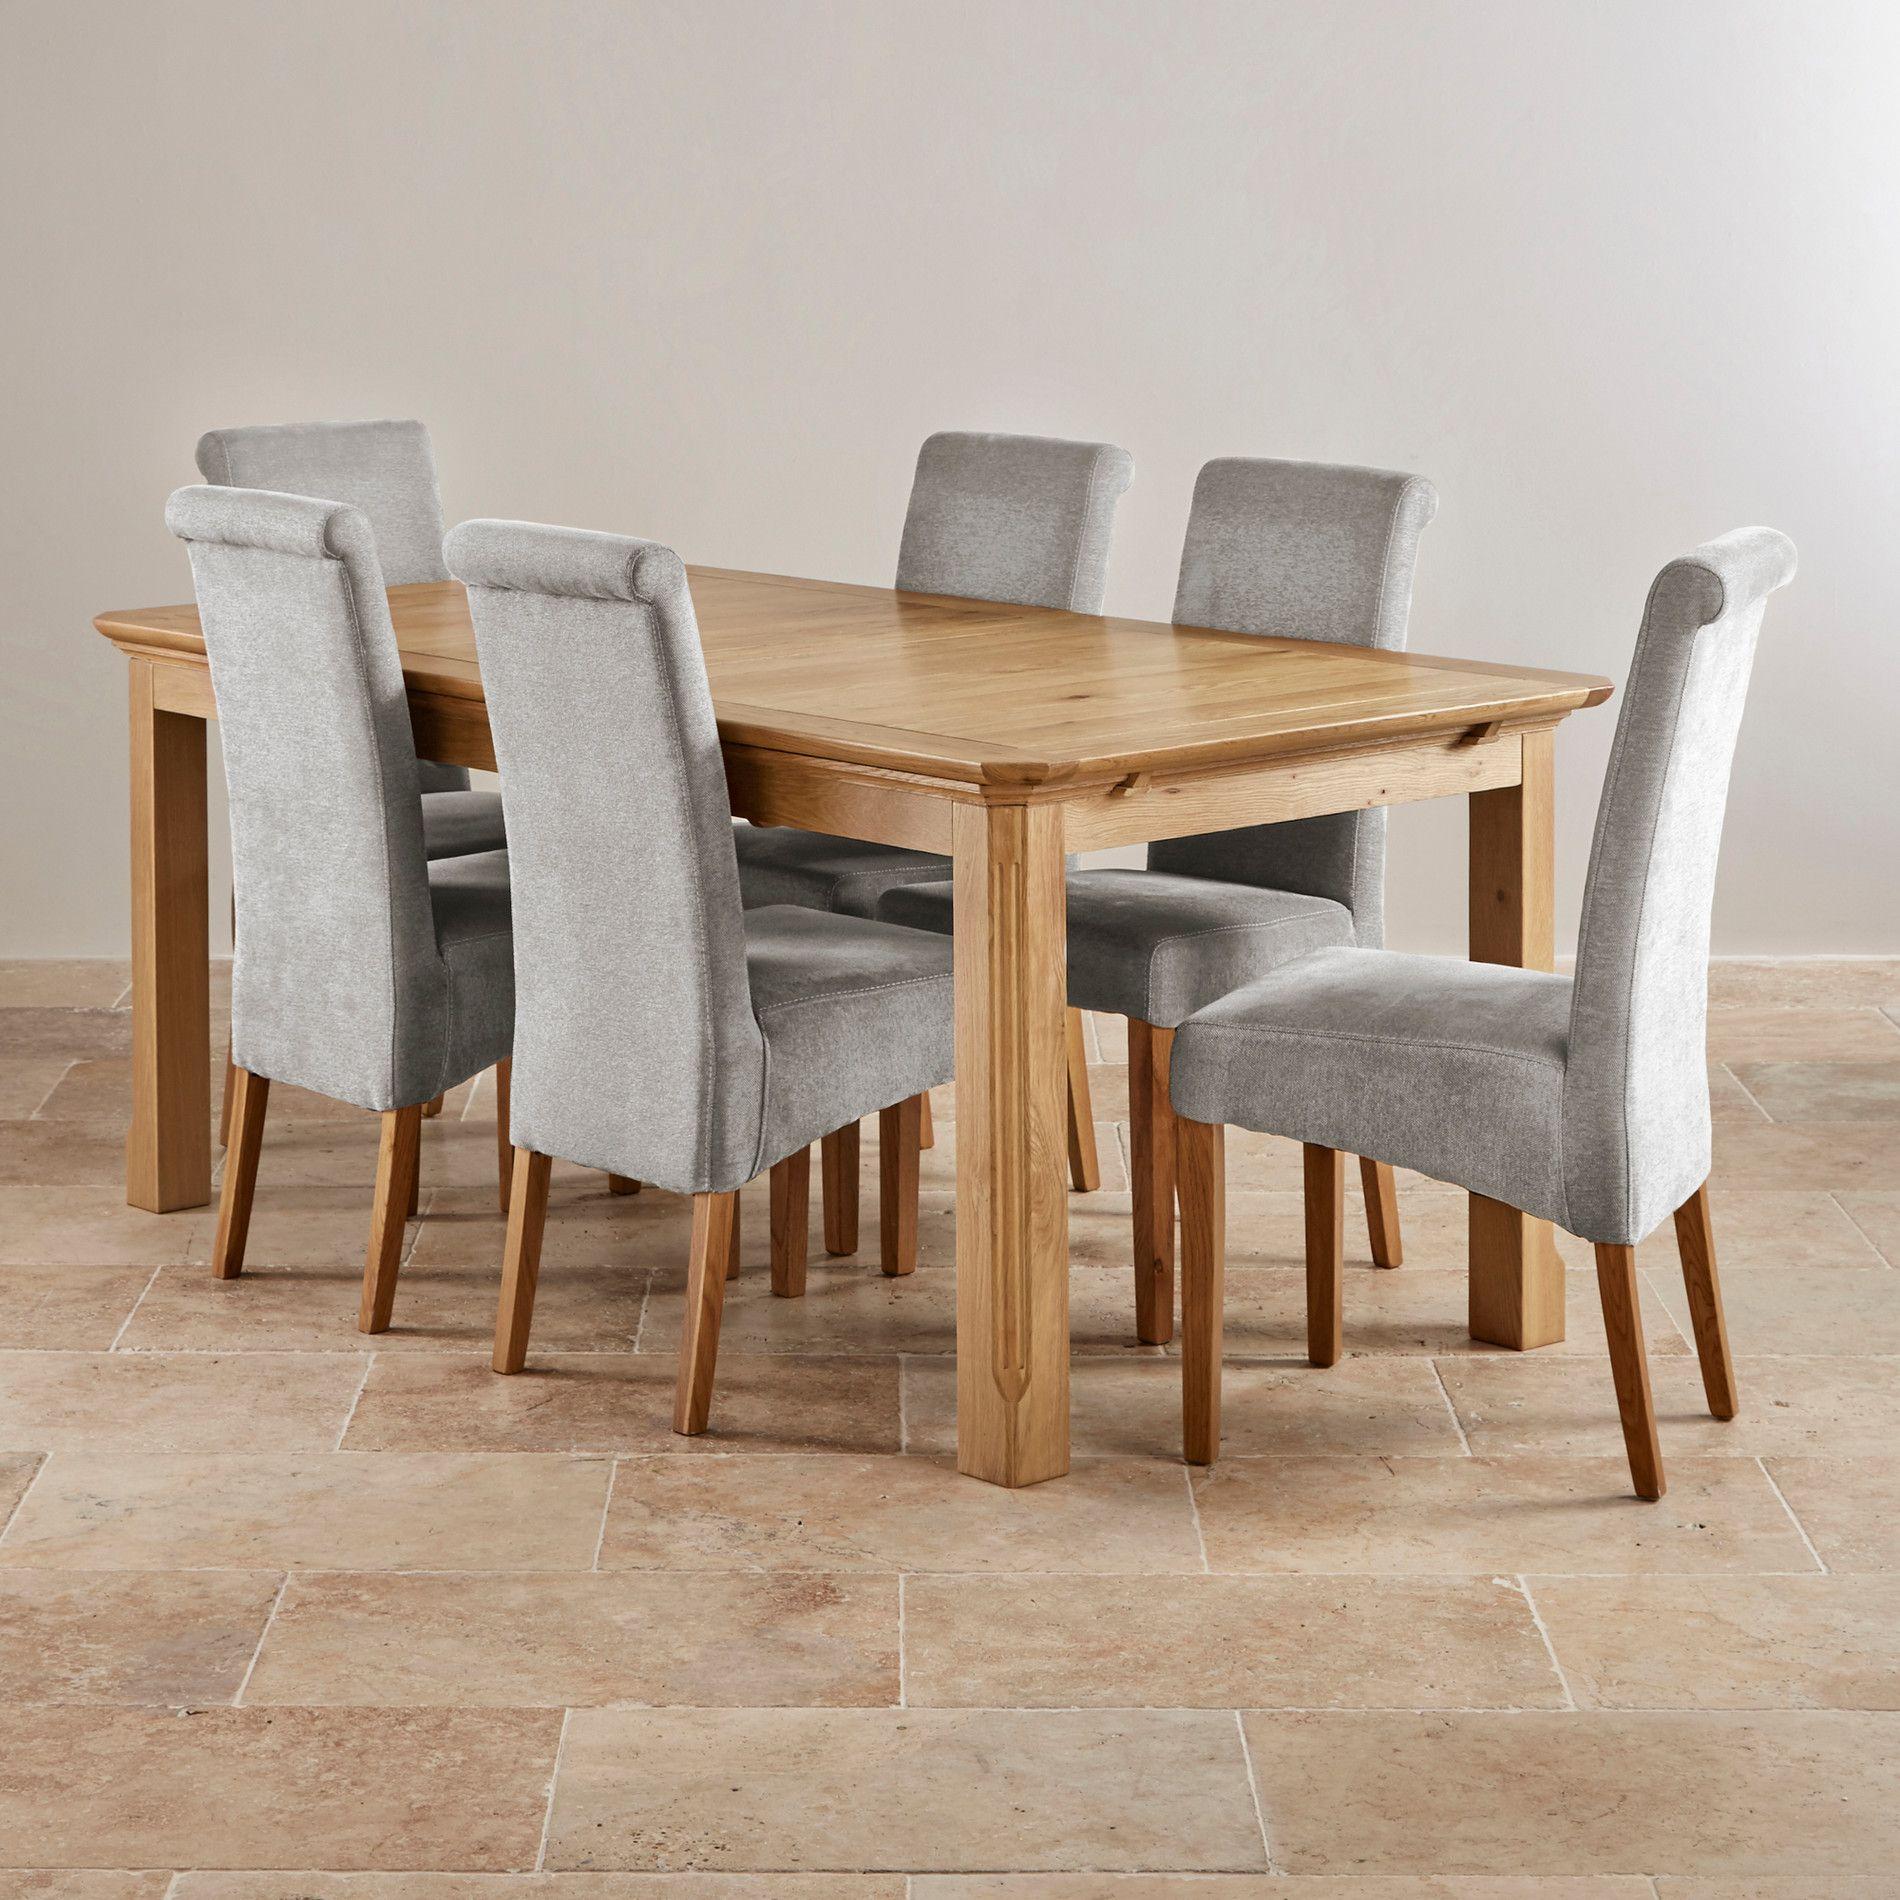 Edinburgh Solid Oak Dining Set 6ft Extending Table 6 Grey Chairs